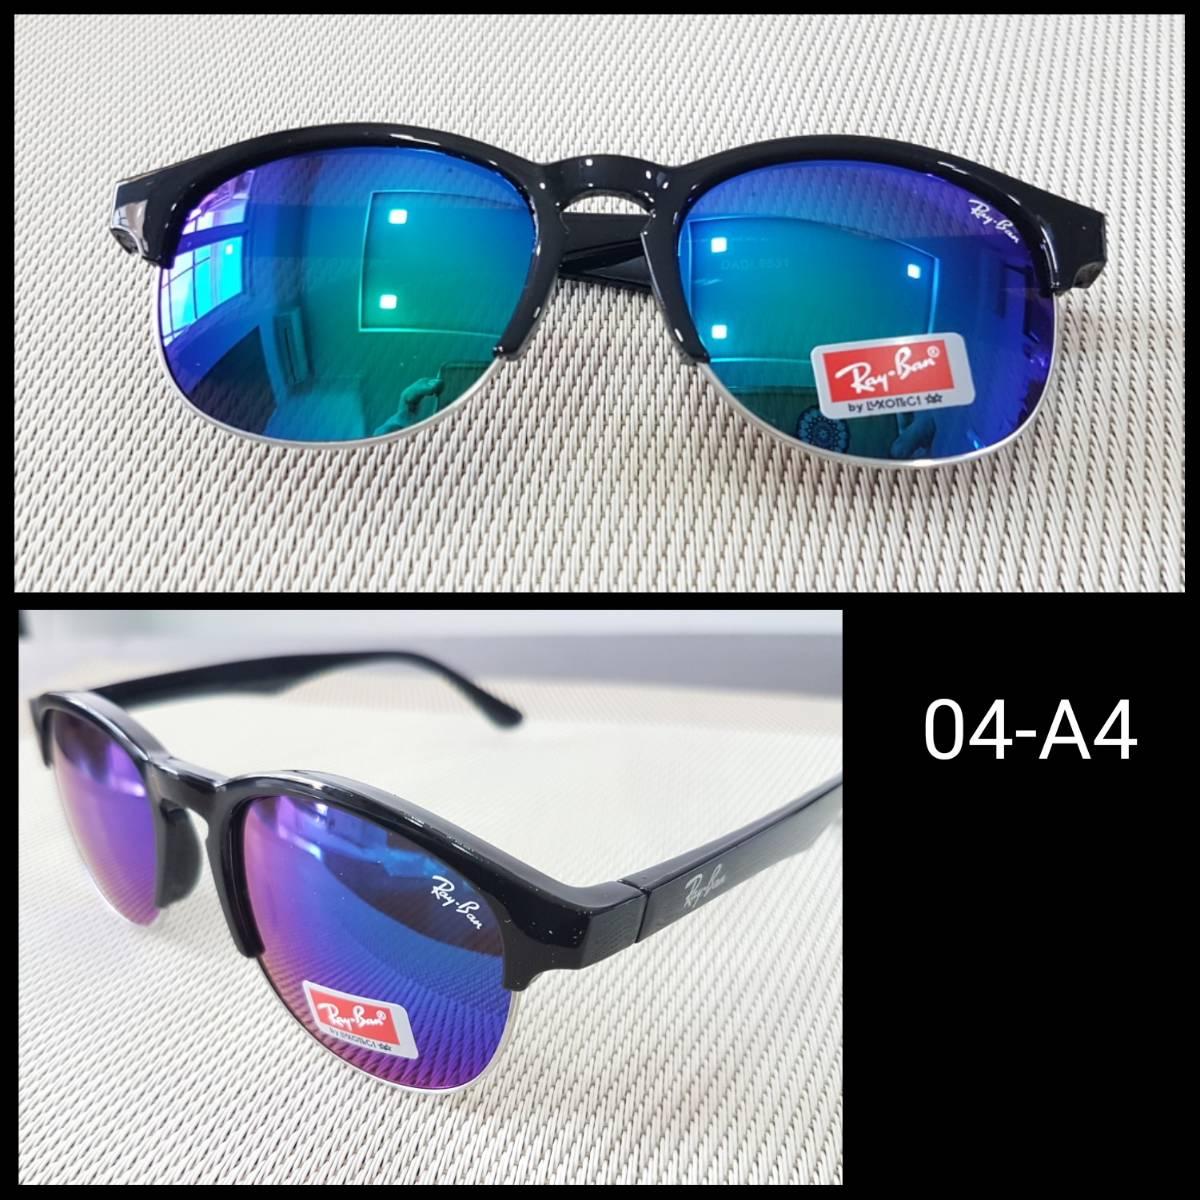 Kacamata Rayban F1 Light Blue1